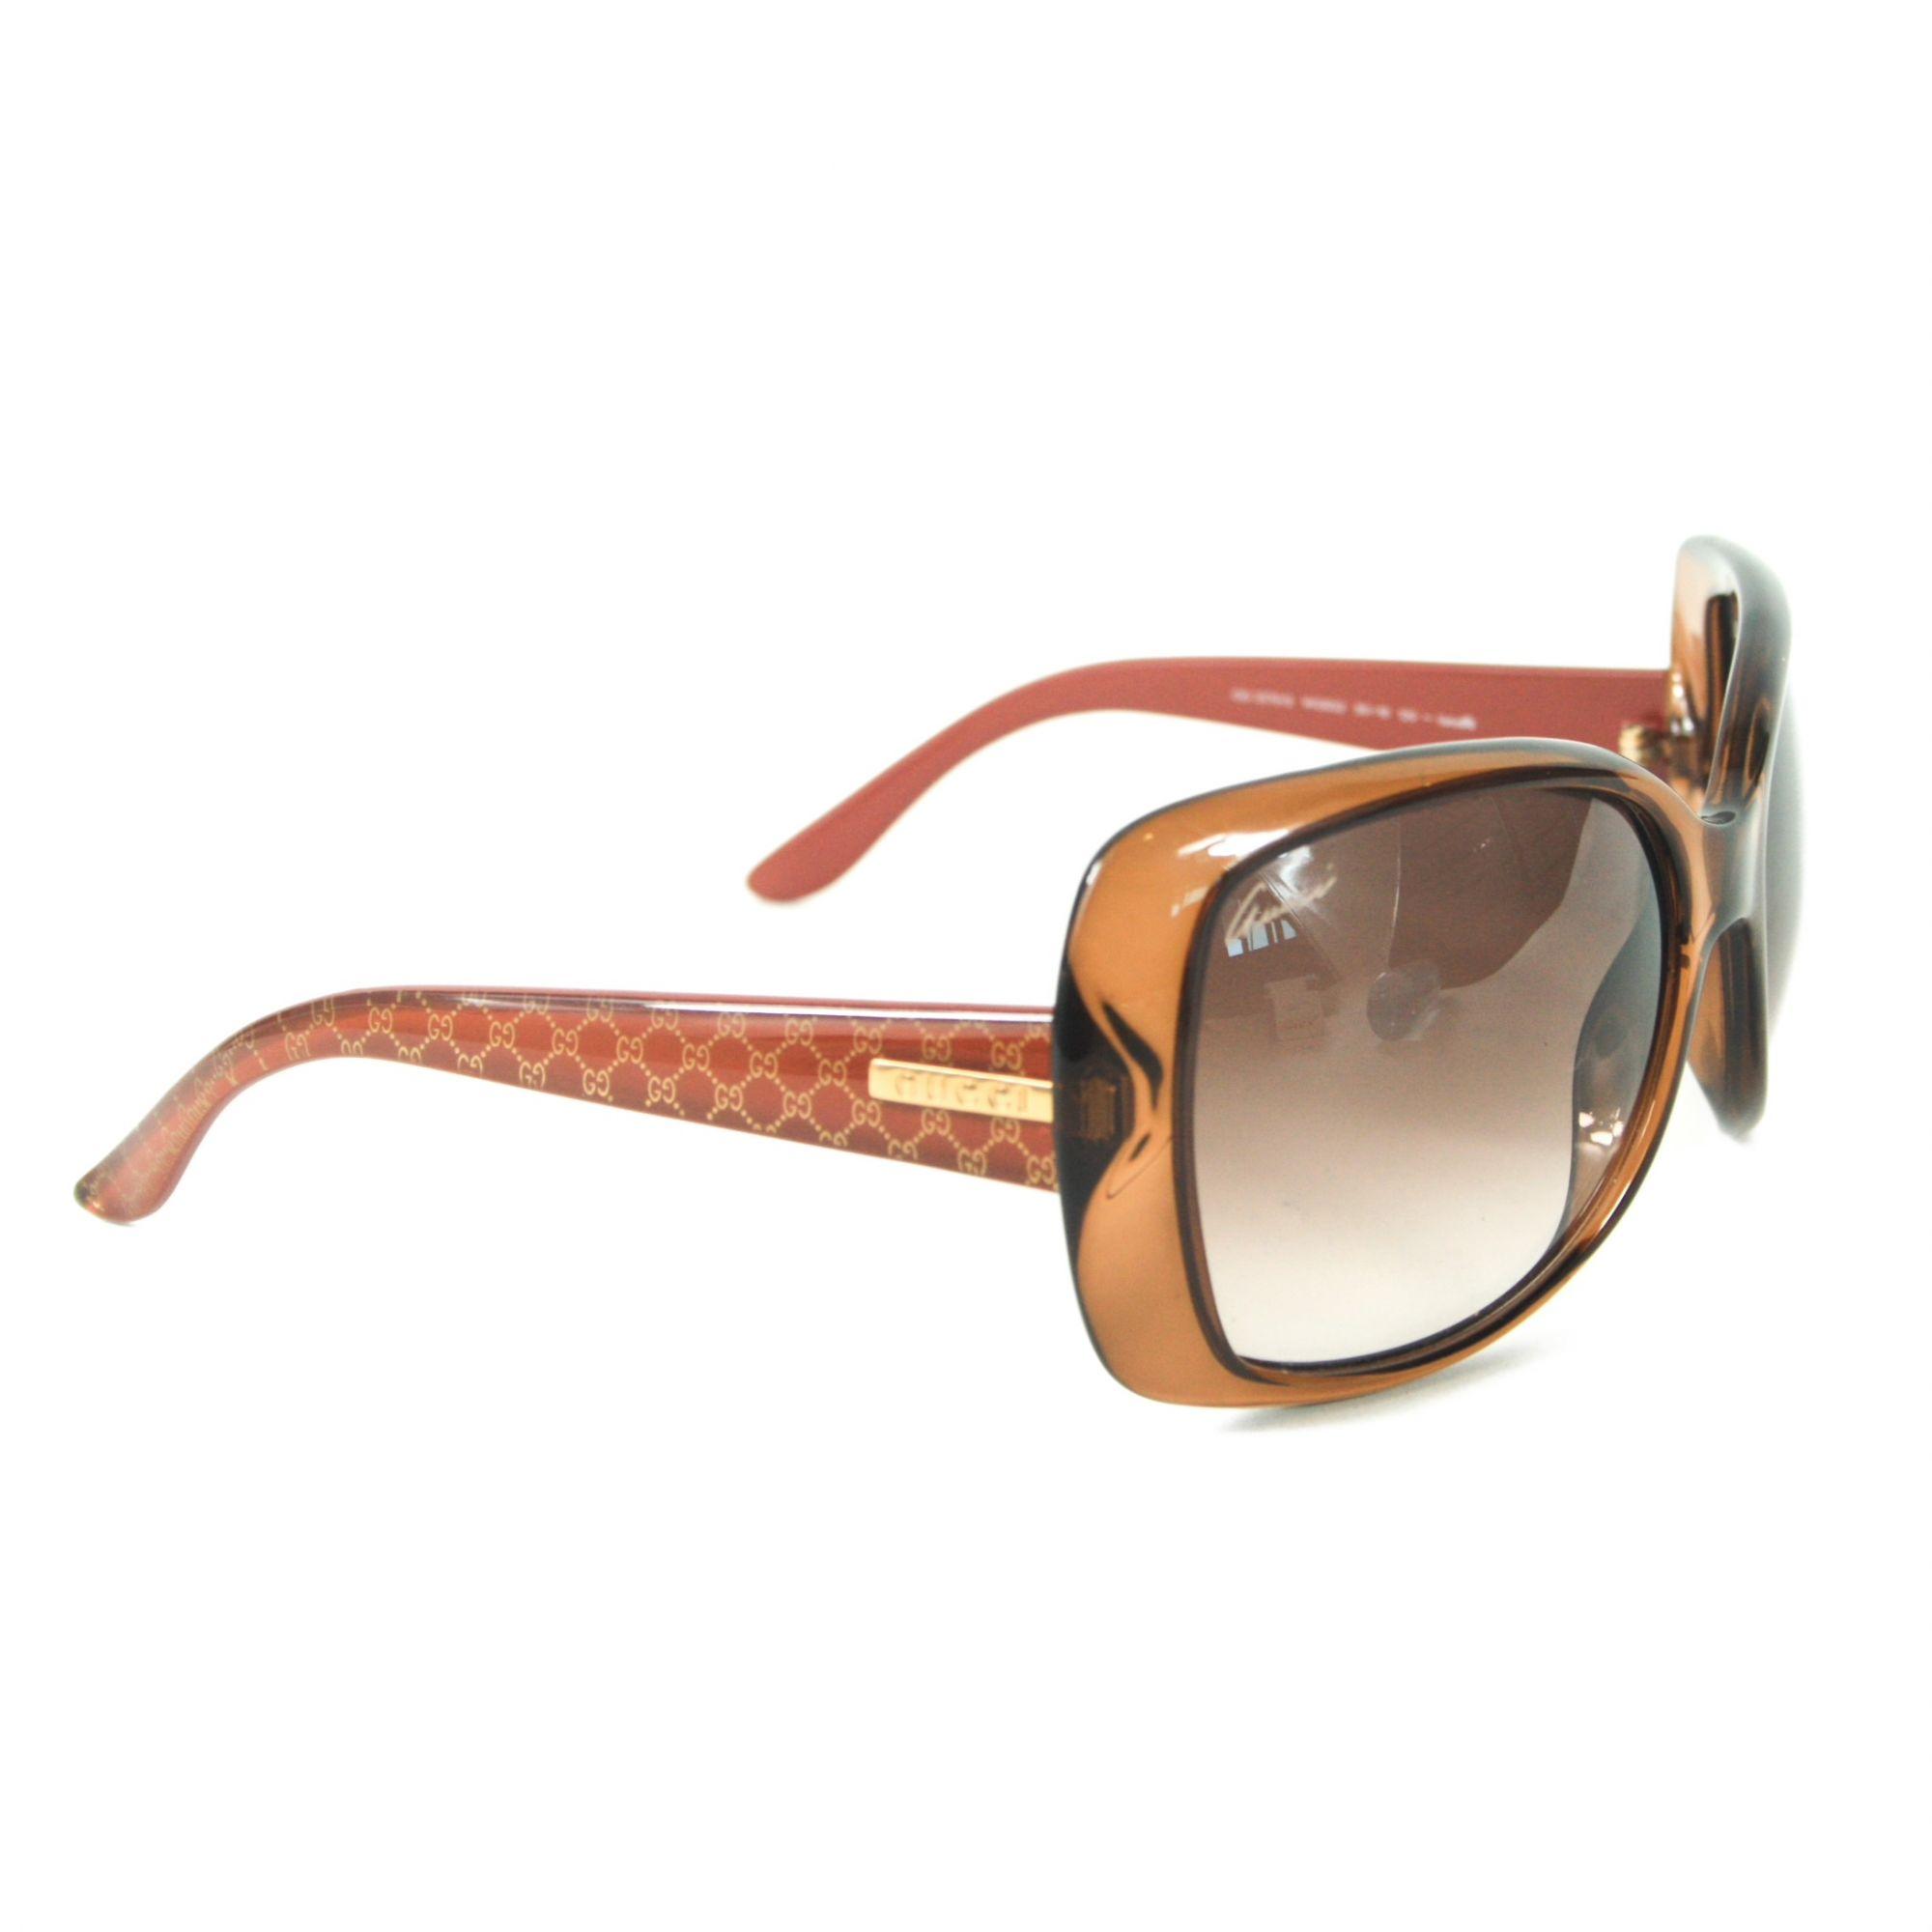 Red GG Sunglasses